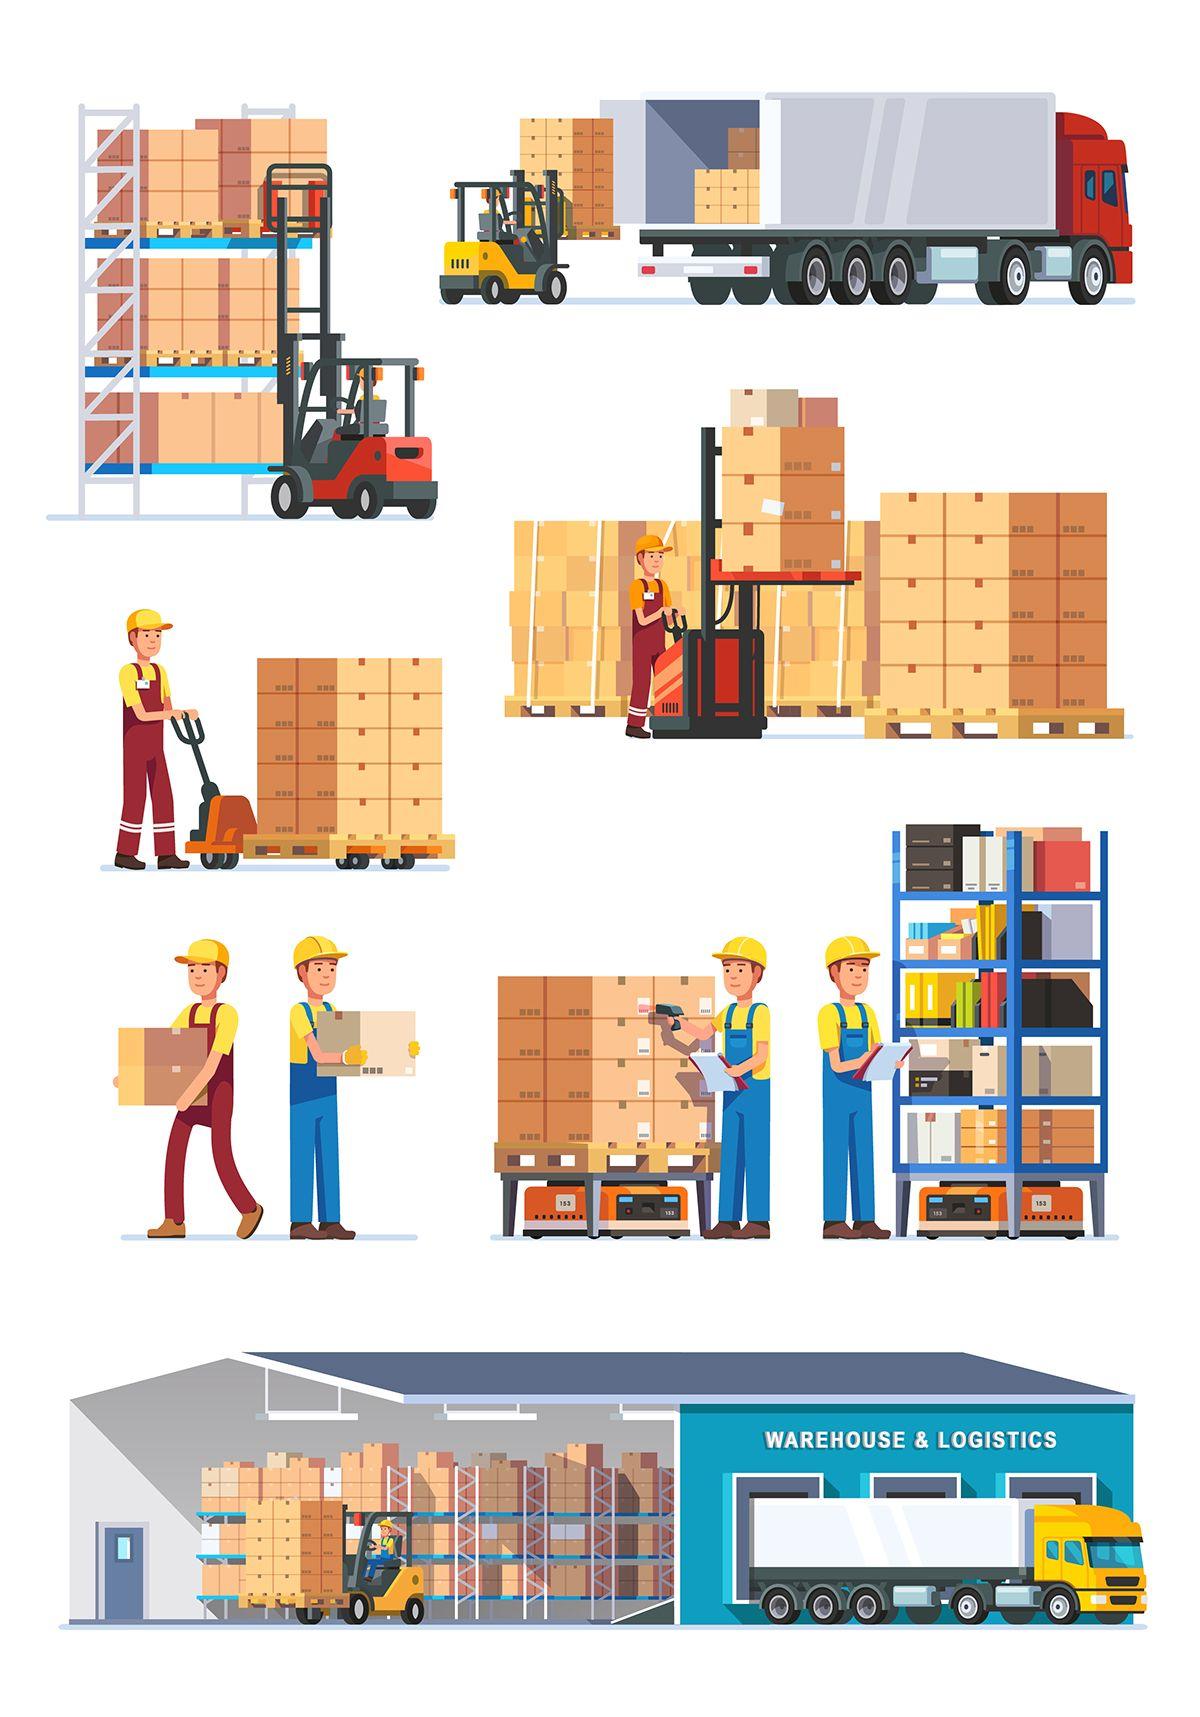 Logistics & Warehousing on Behance ดีไซน์, ภาพประกอบ